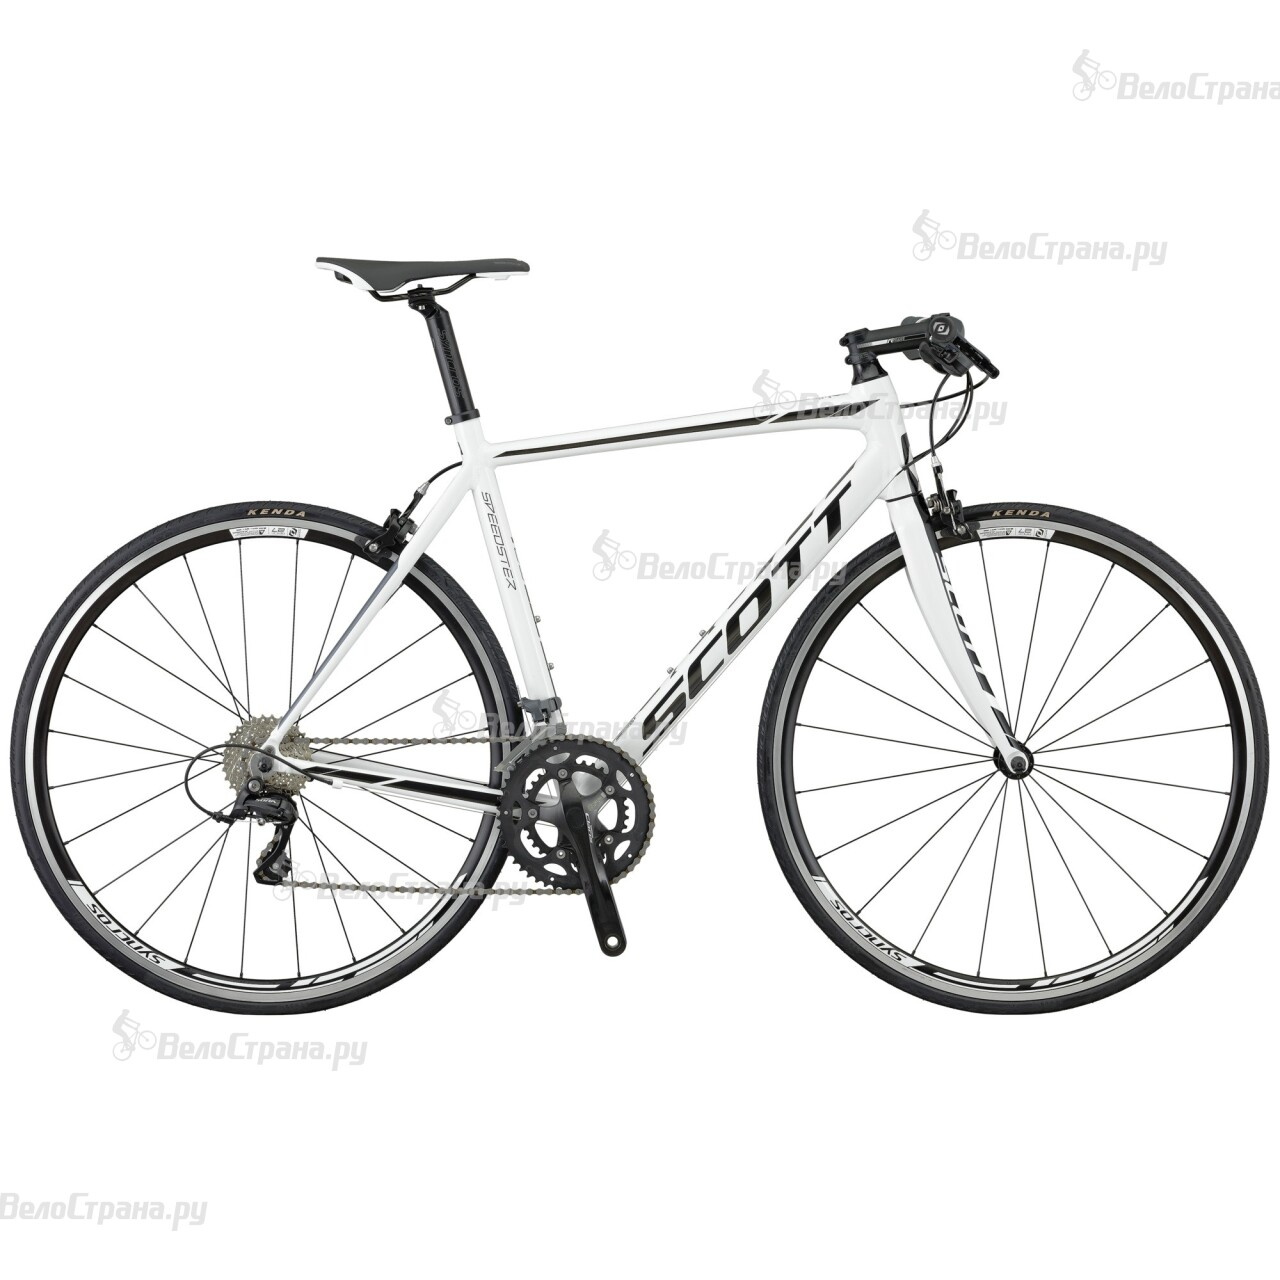 Велосипед Scott Speedster 50 FB (2016) greenell fb 1